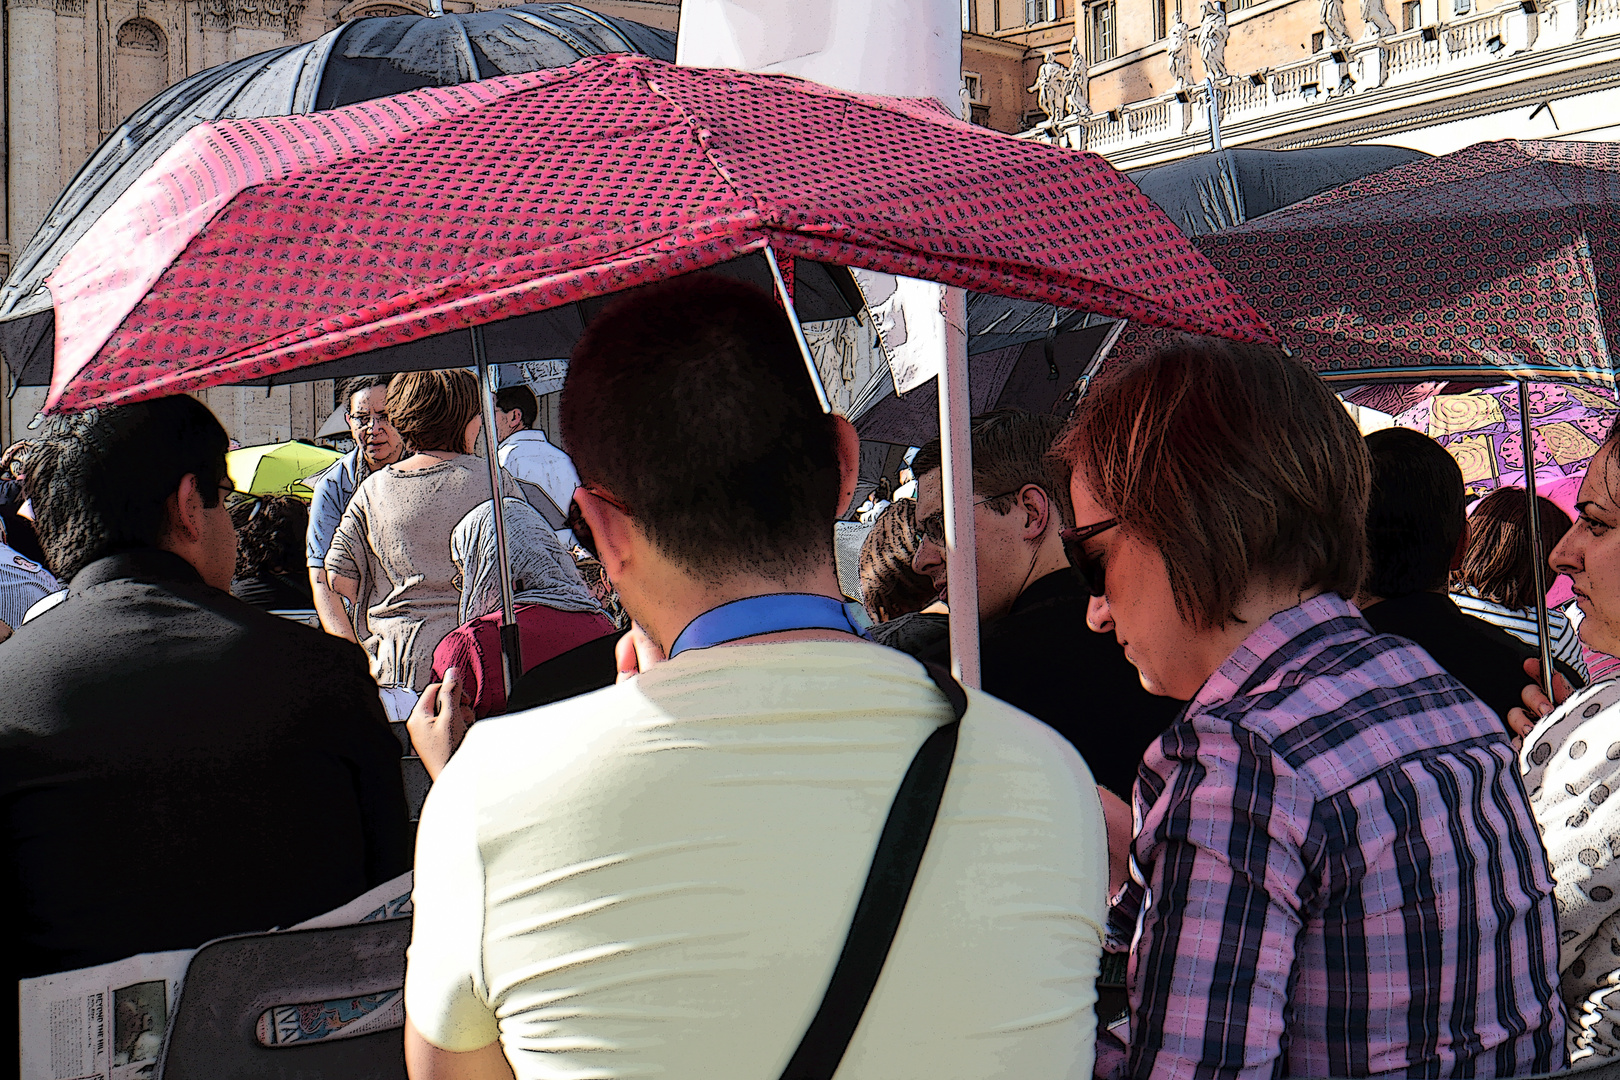 Sonnenschirm?